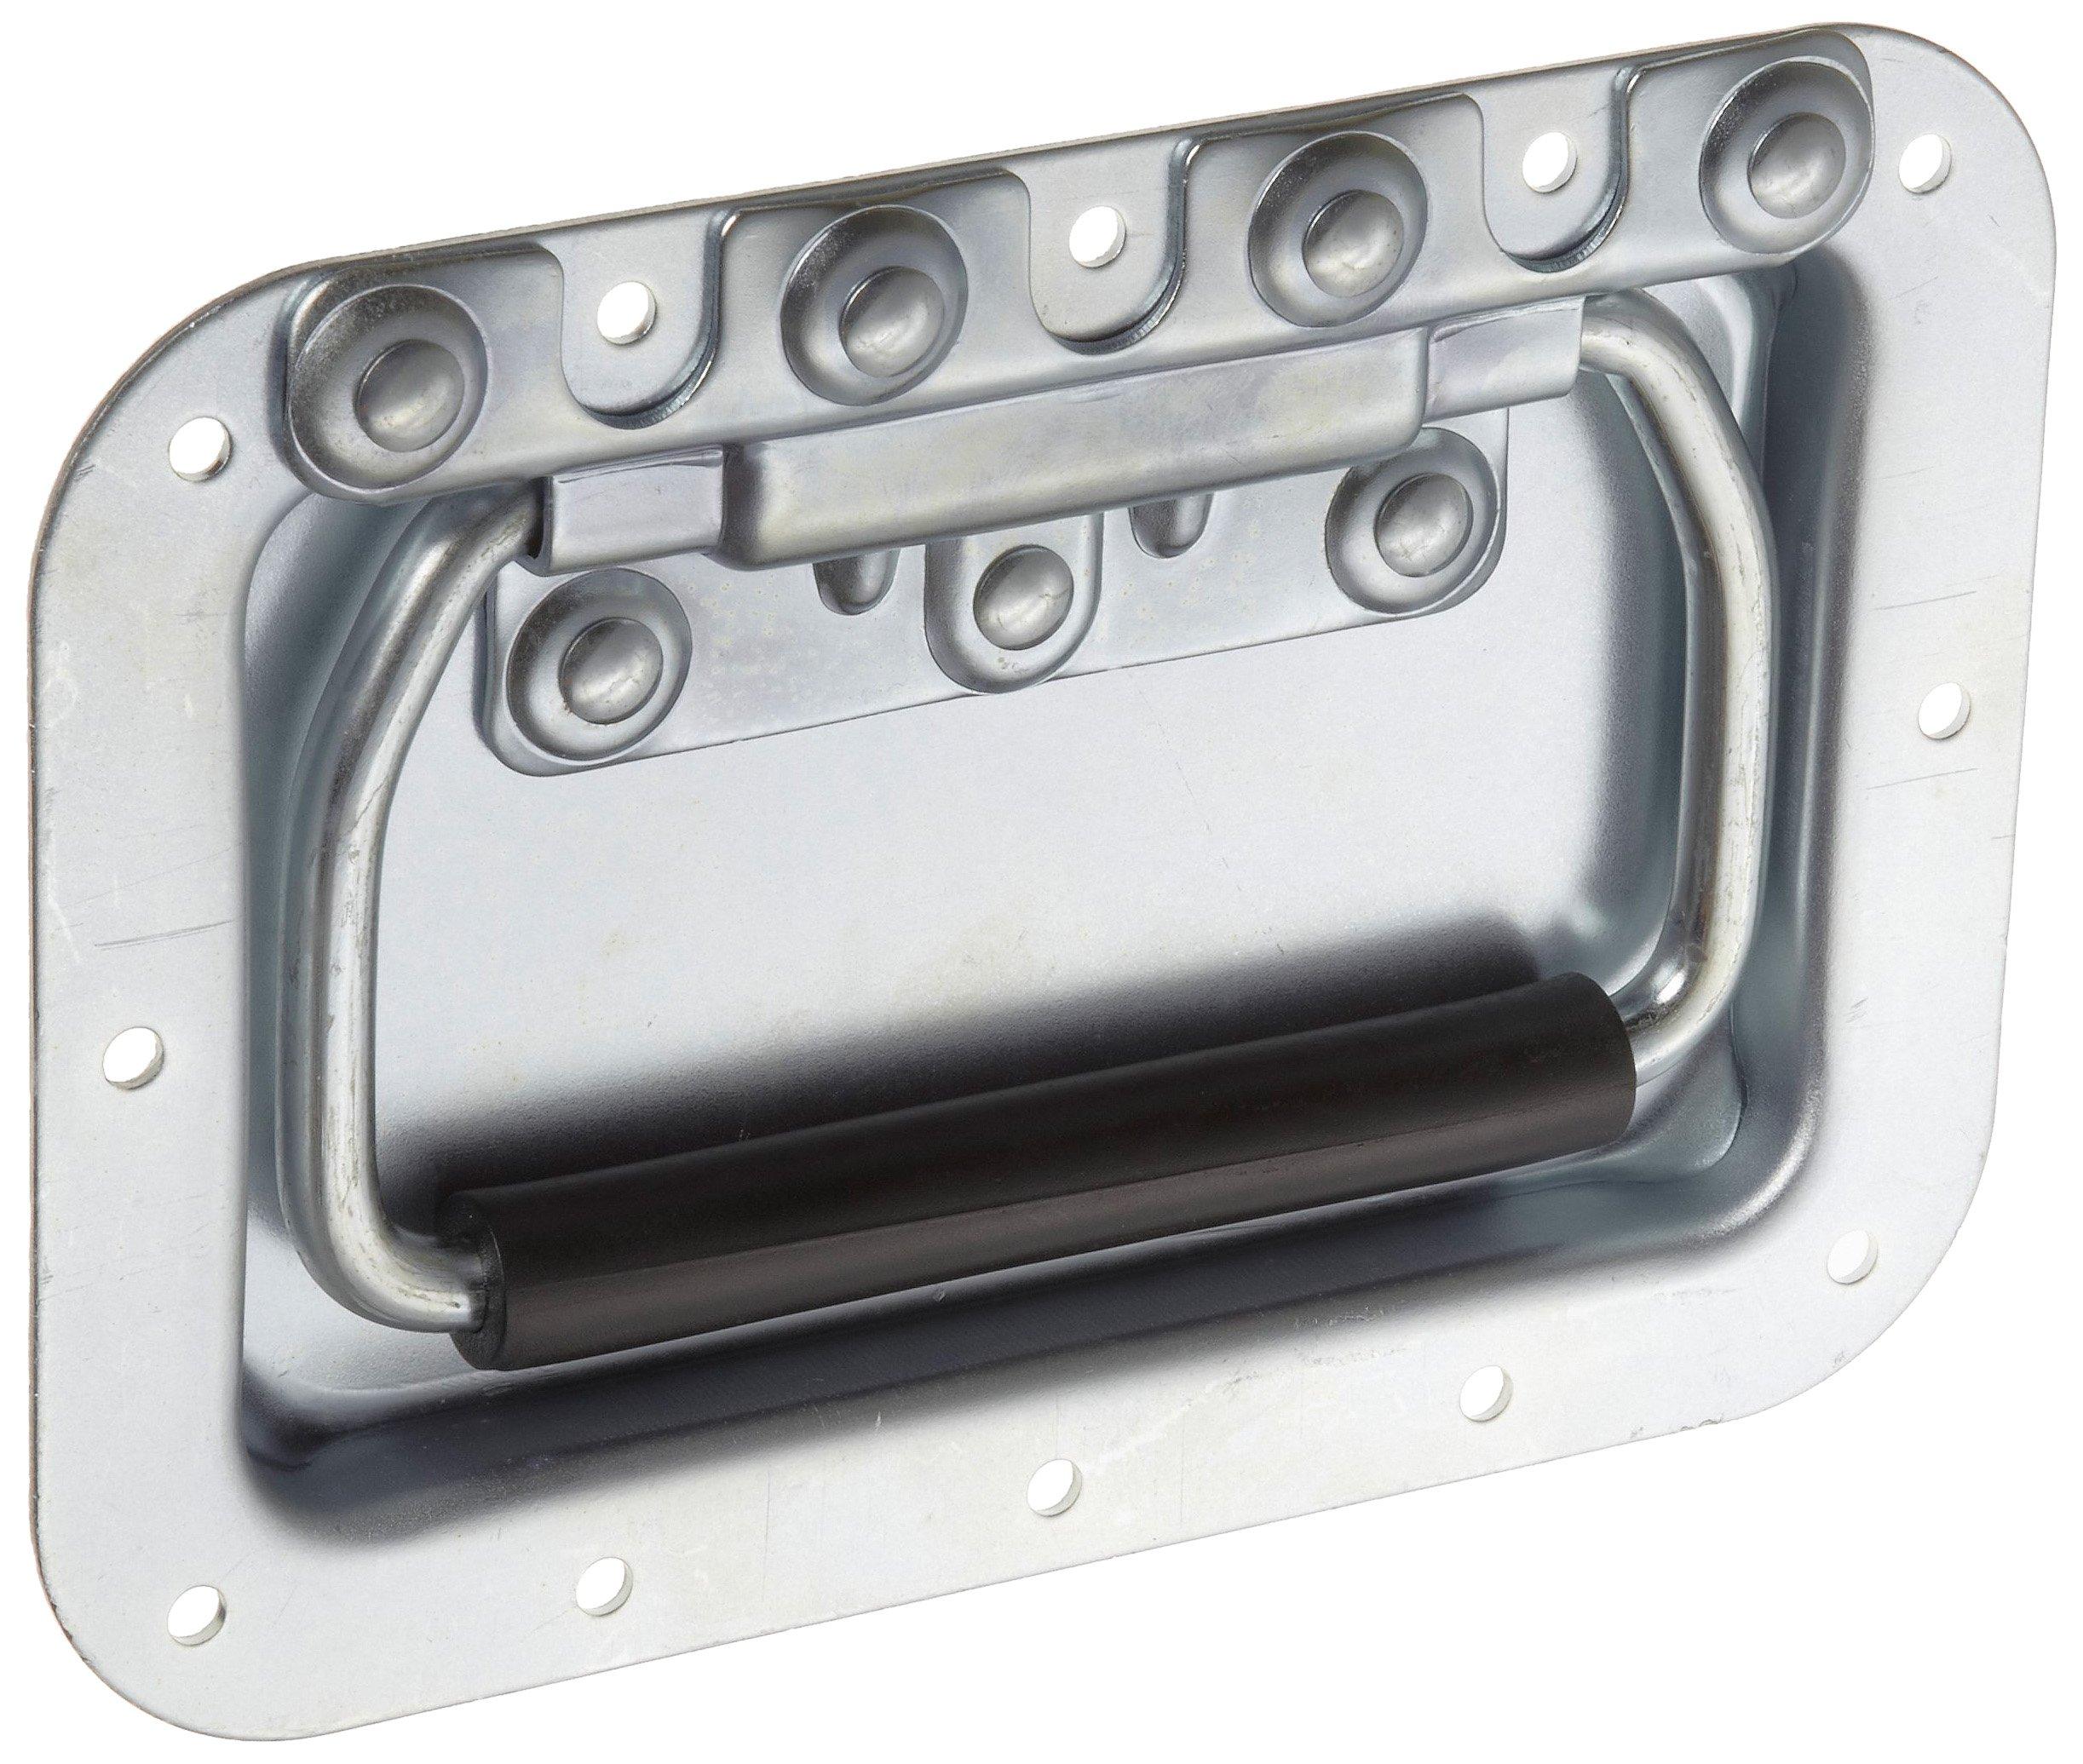 Monroe Steel Load Rated Pull Handle, Folding Style